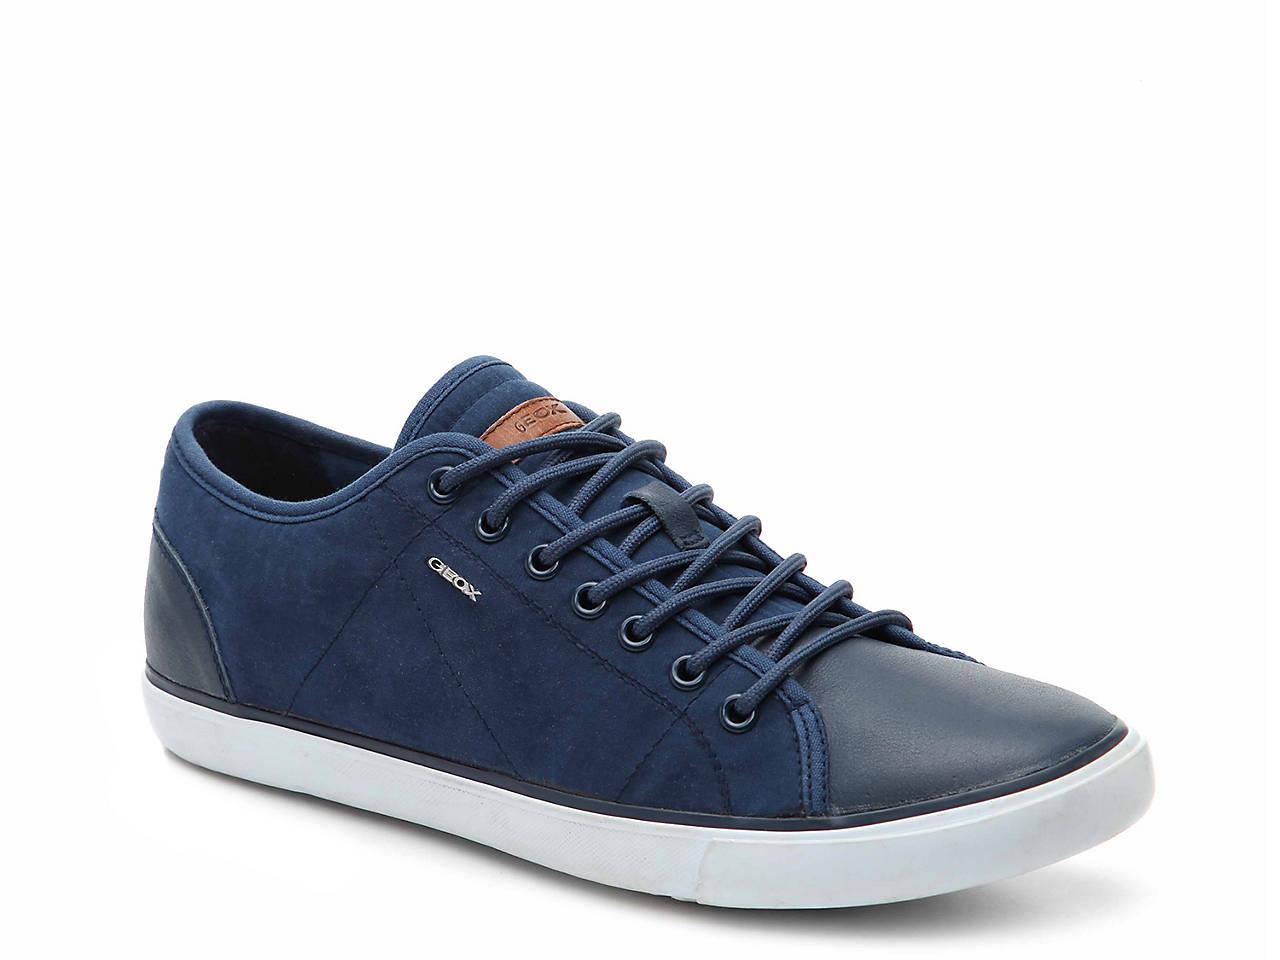 finest selection bcdb0 8a3c7 Smart Sneaker